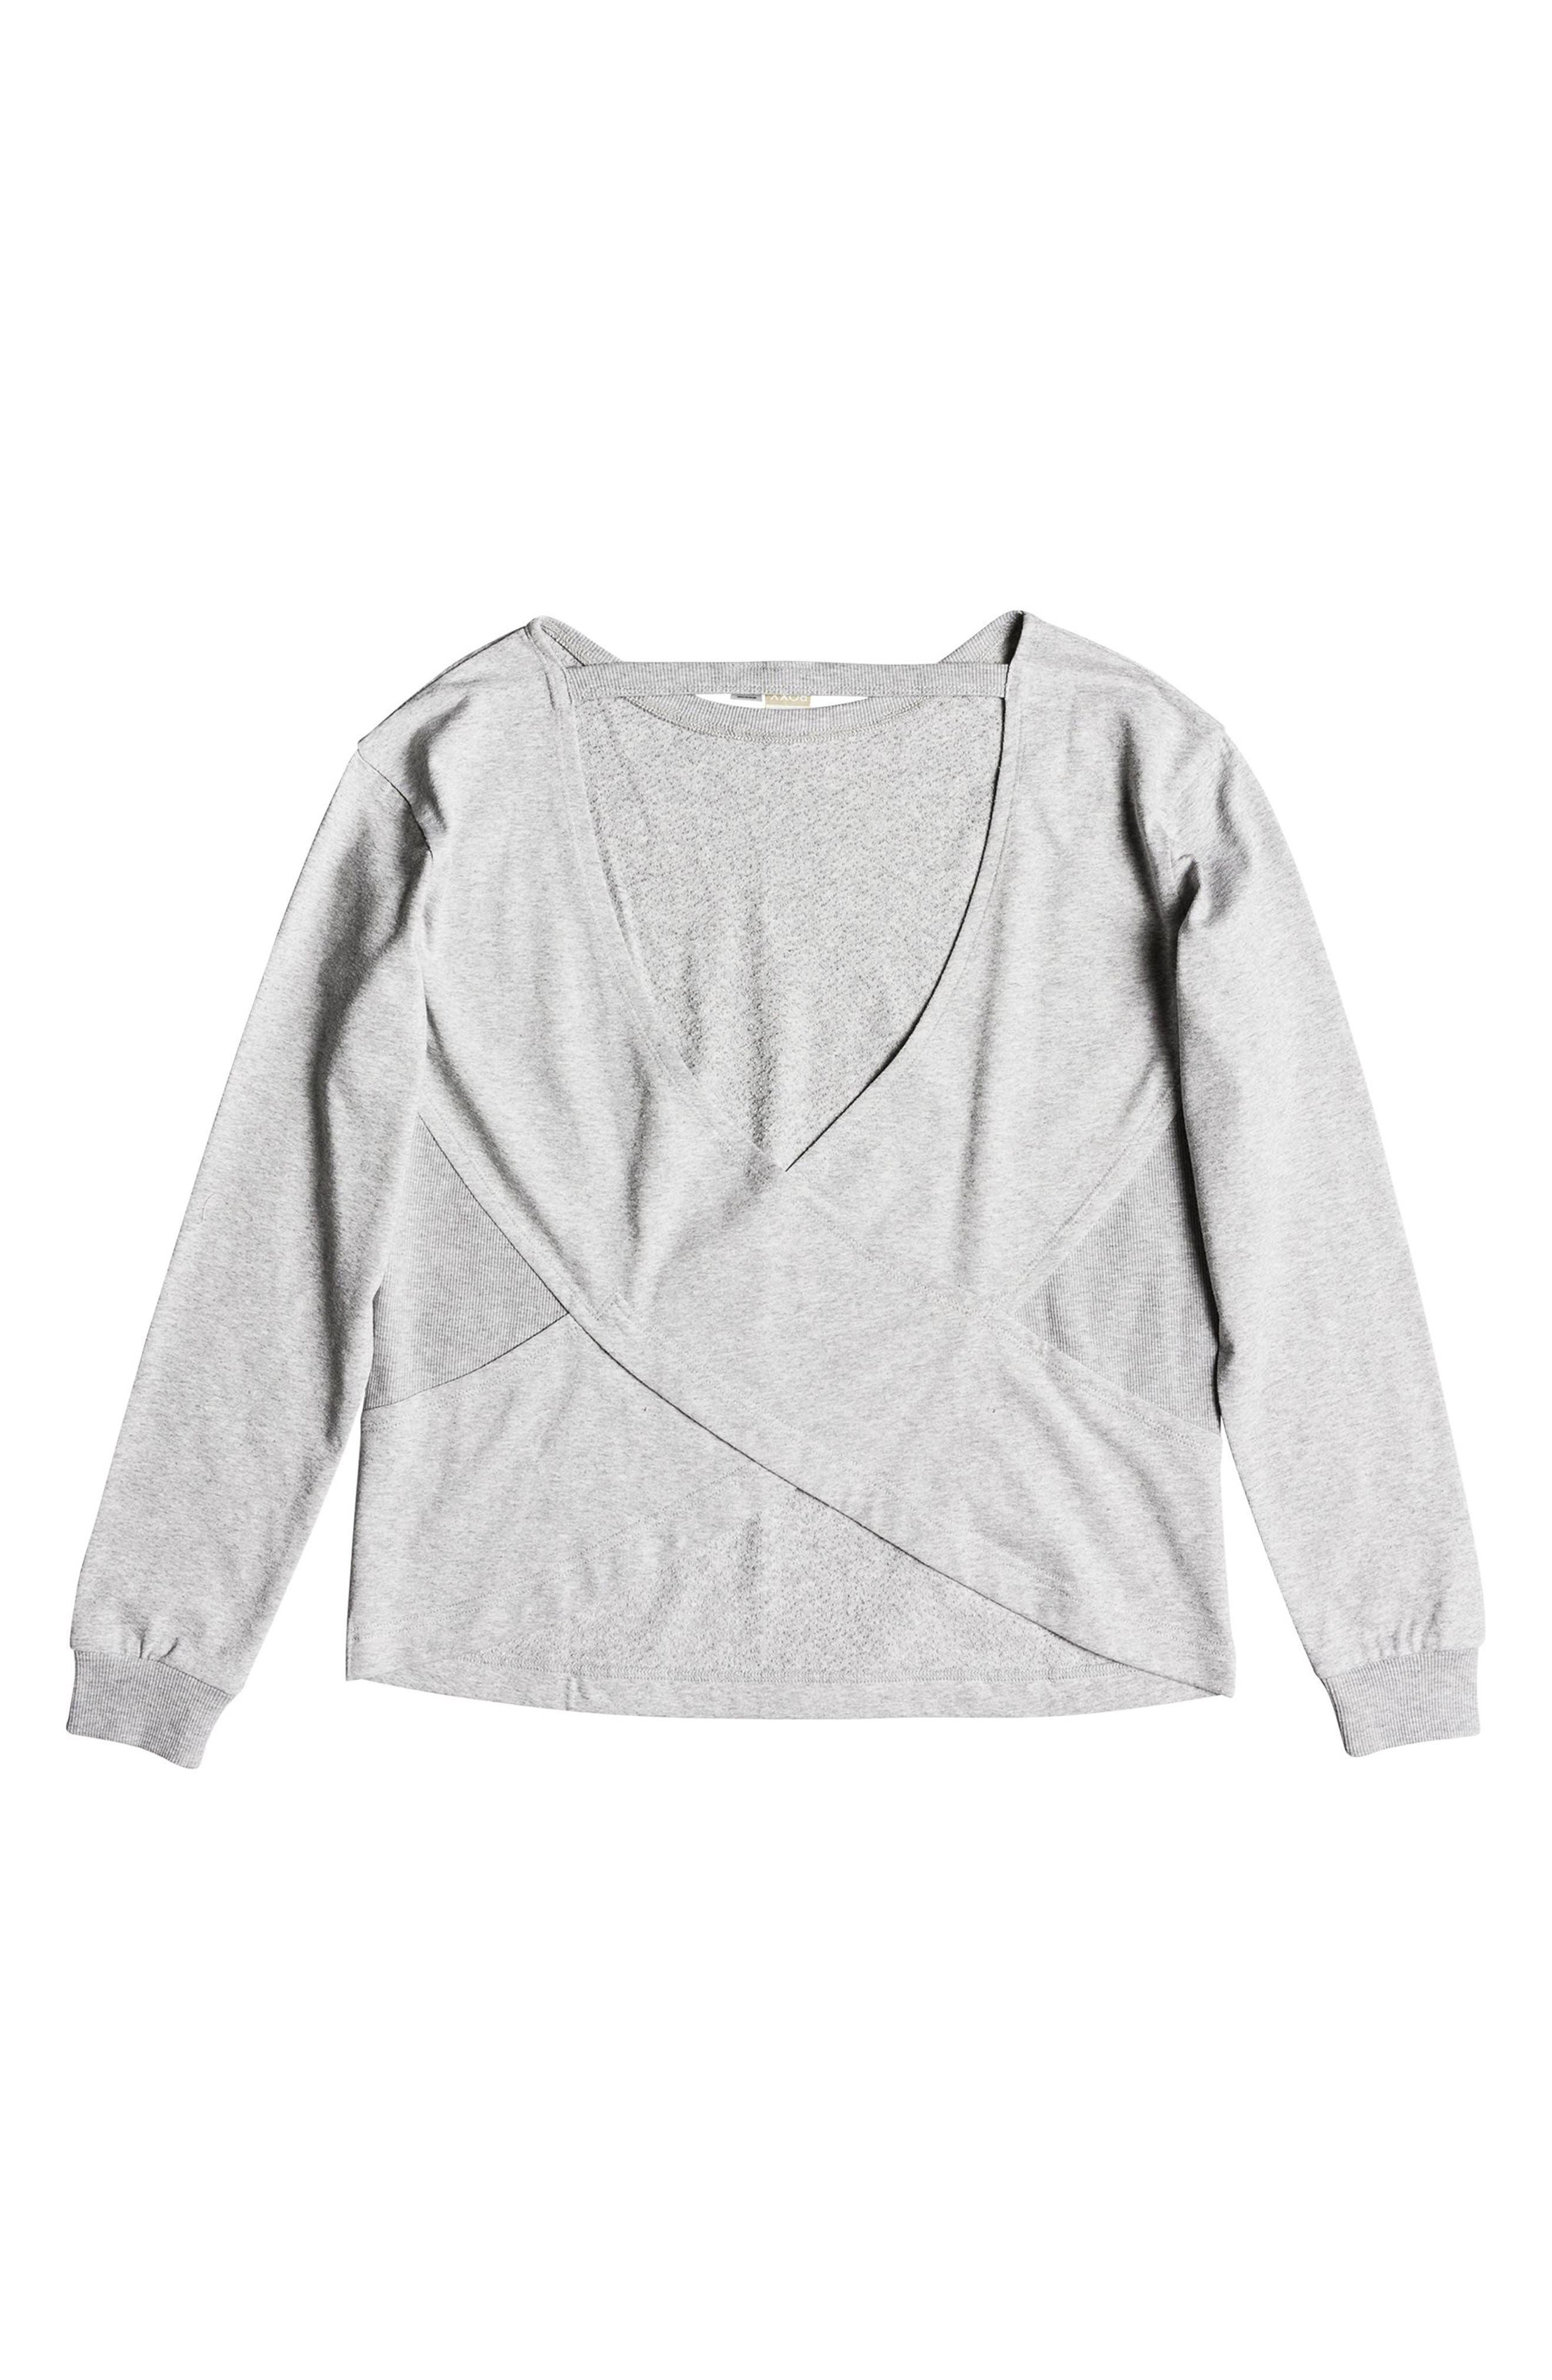 Journey On Open Back Sweatshirt,                             Alternate thumbnail 5, color,                             HERITAGE HEATHER